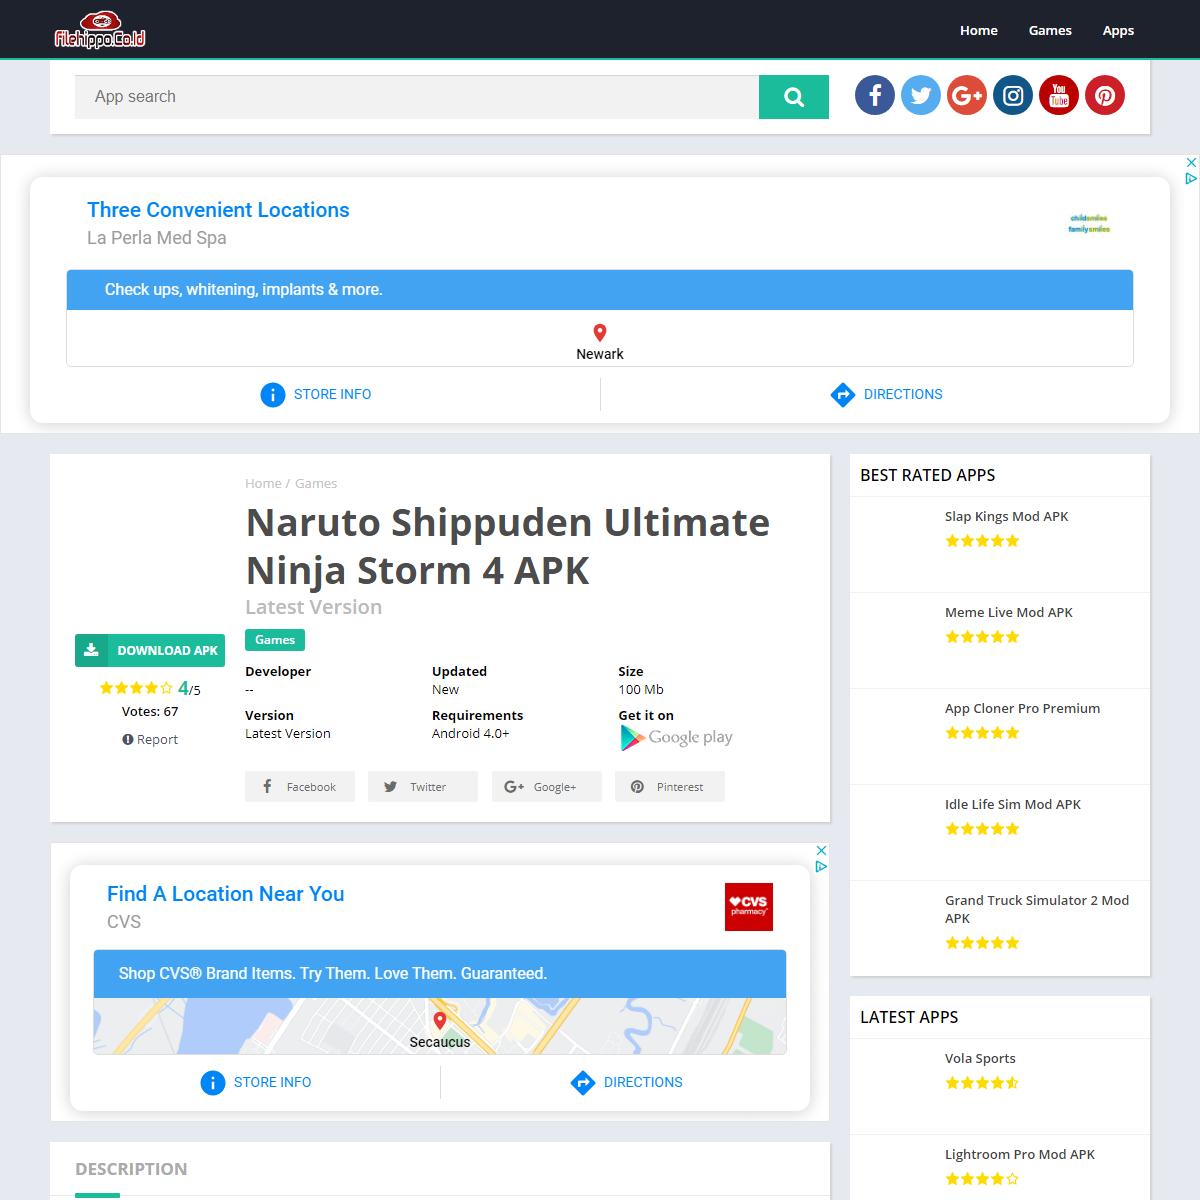 Naruto Shippuden Ultimate Ninja Storm 4 APK – FileHippo